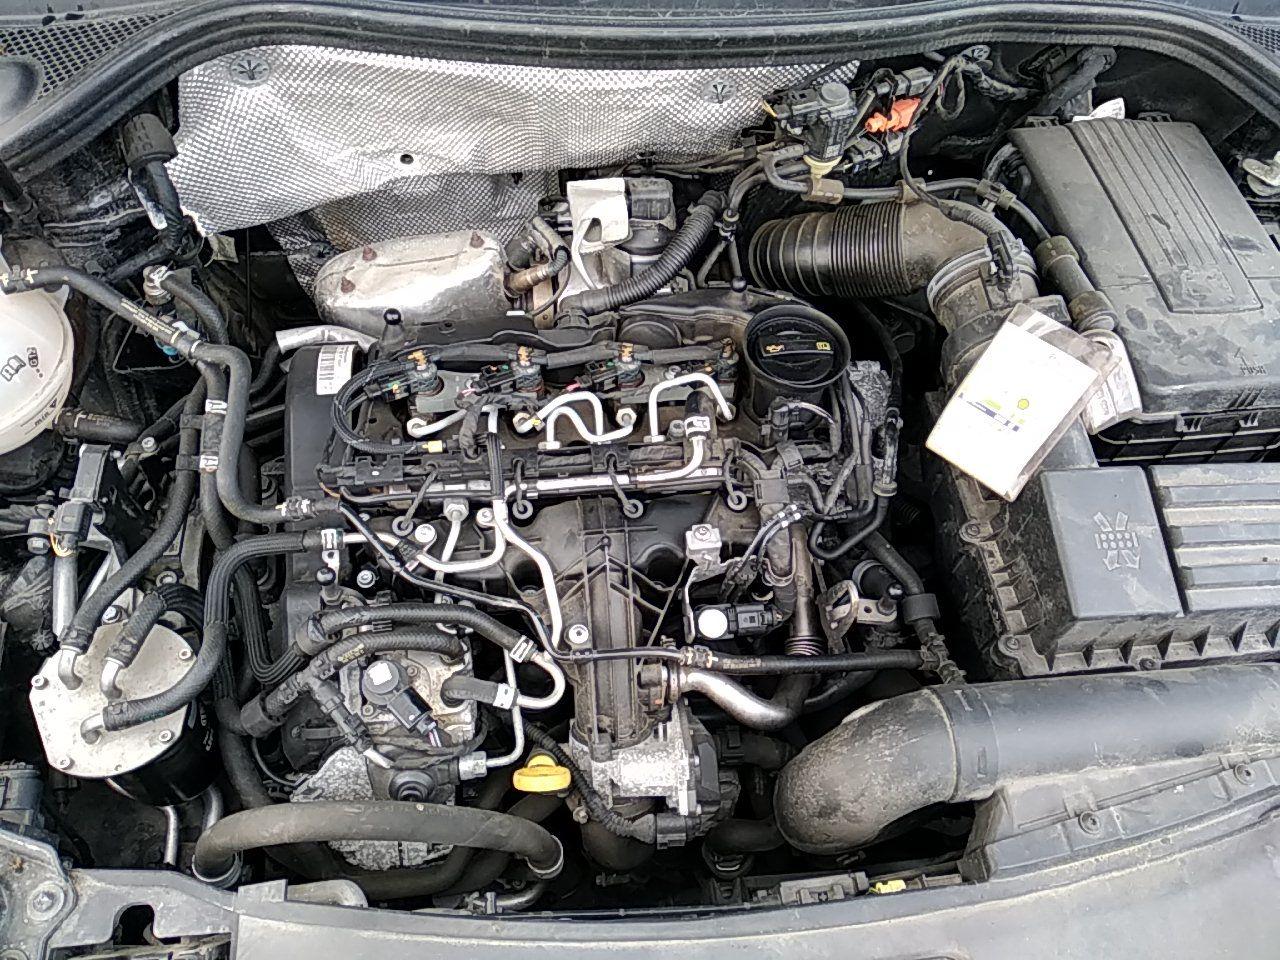 Bloco do Motor (20386577).